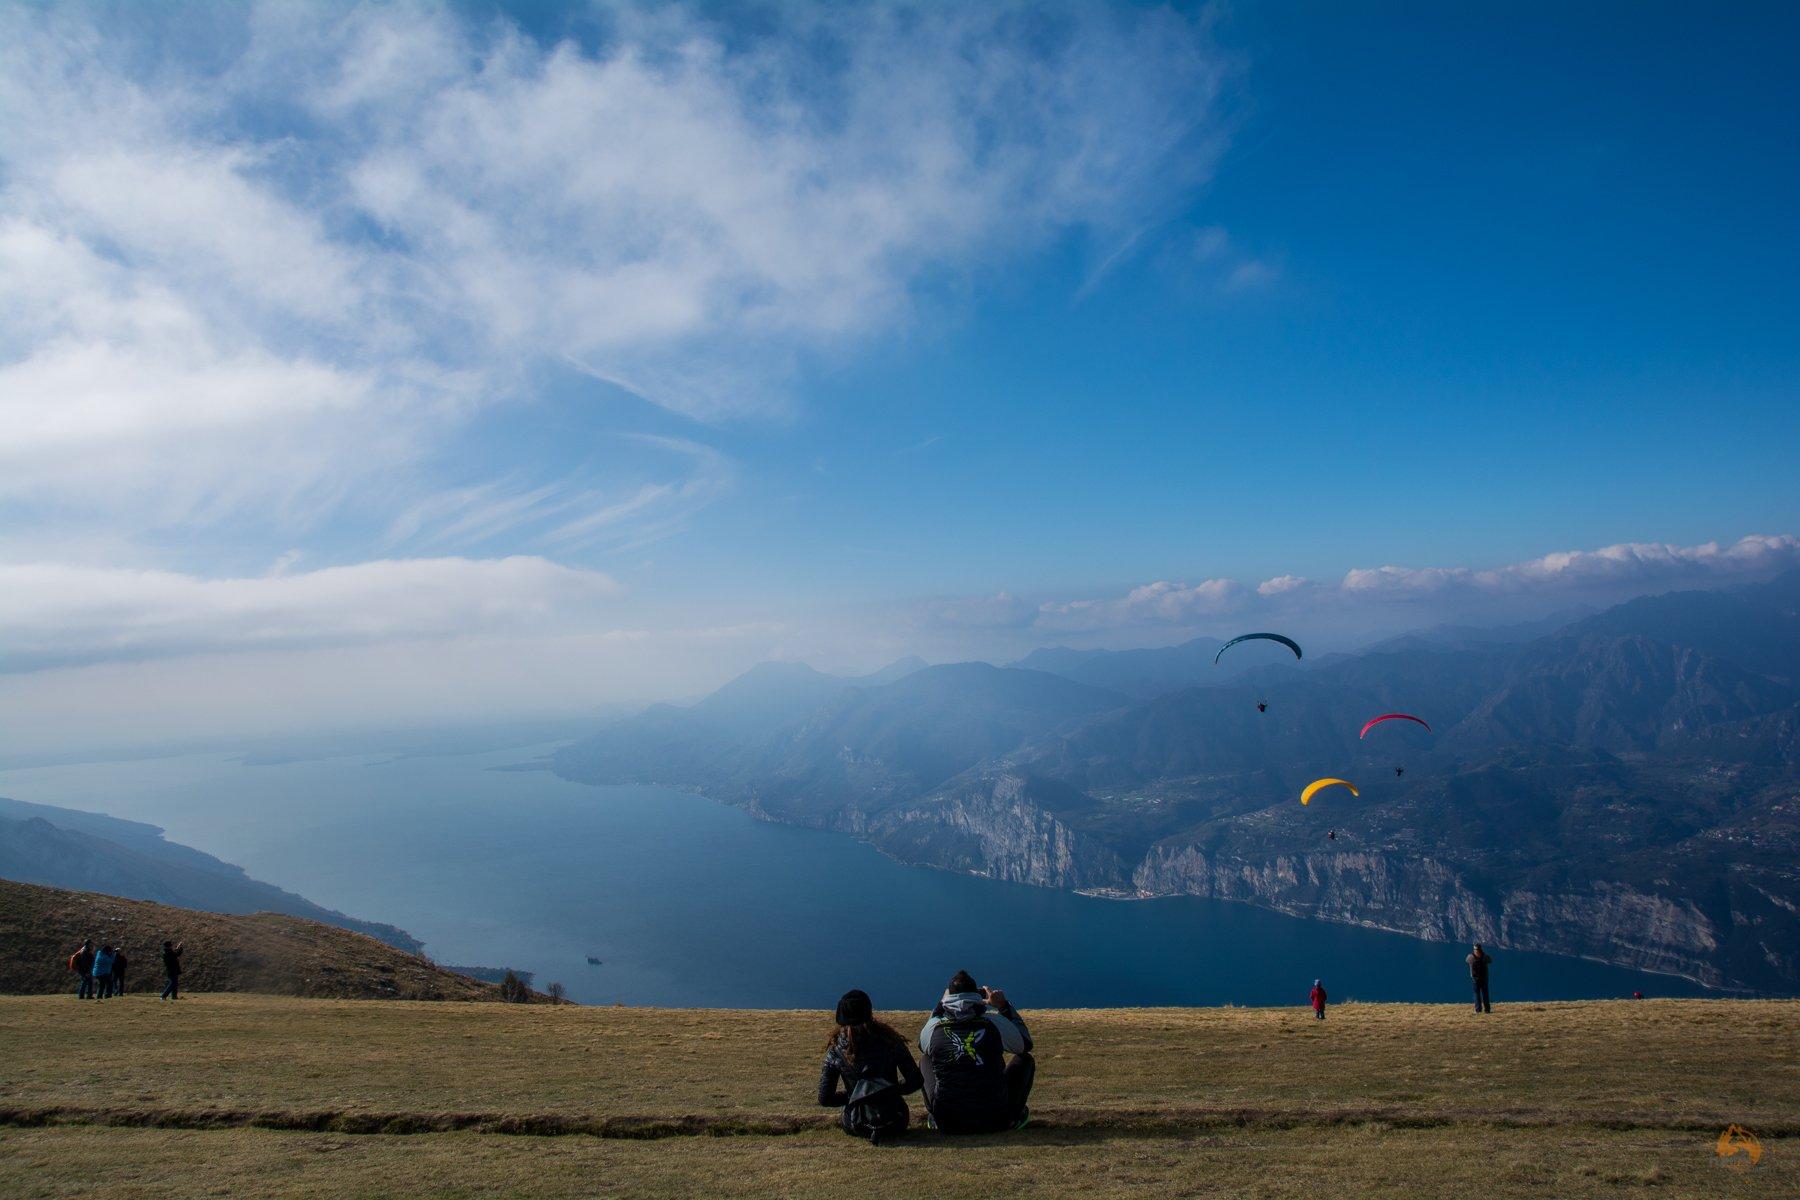 Monte Baldo - Malcesine - Gardasee